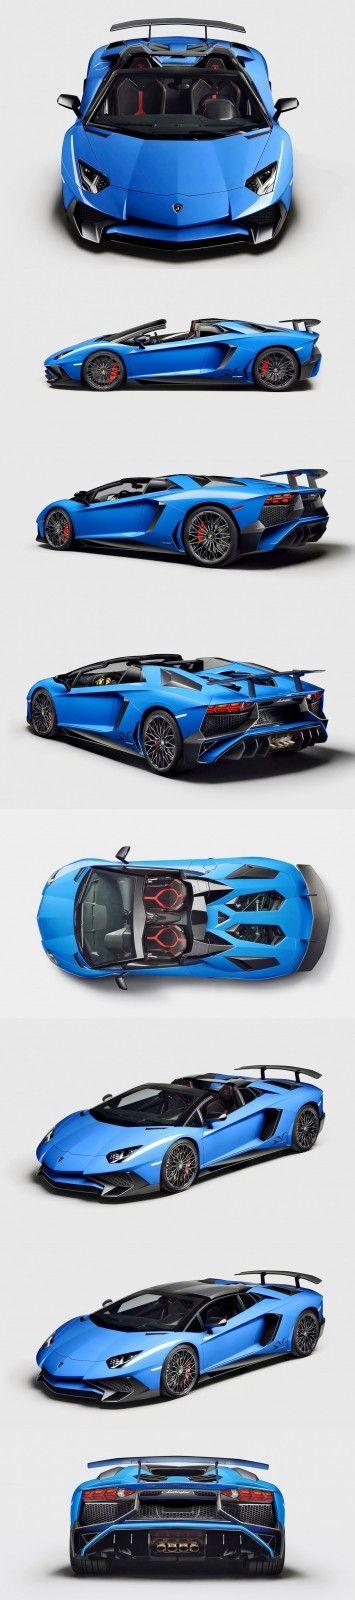 http://www.car-revs-daily.com/2015/08/15/2016-lamborghini-aventador-lp-750-4-superveloce-roadster/